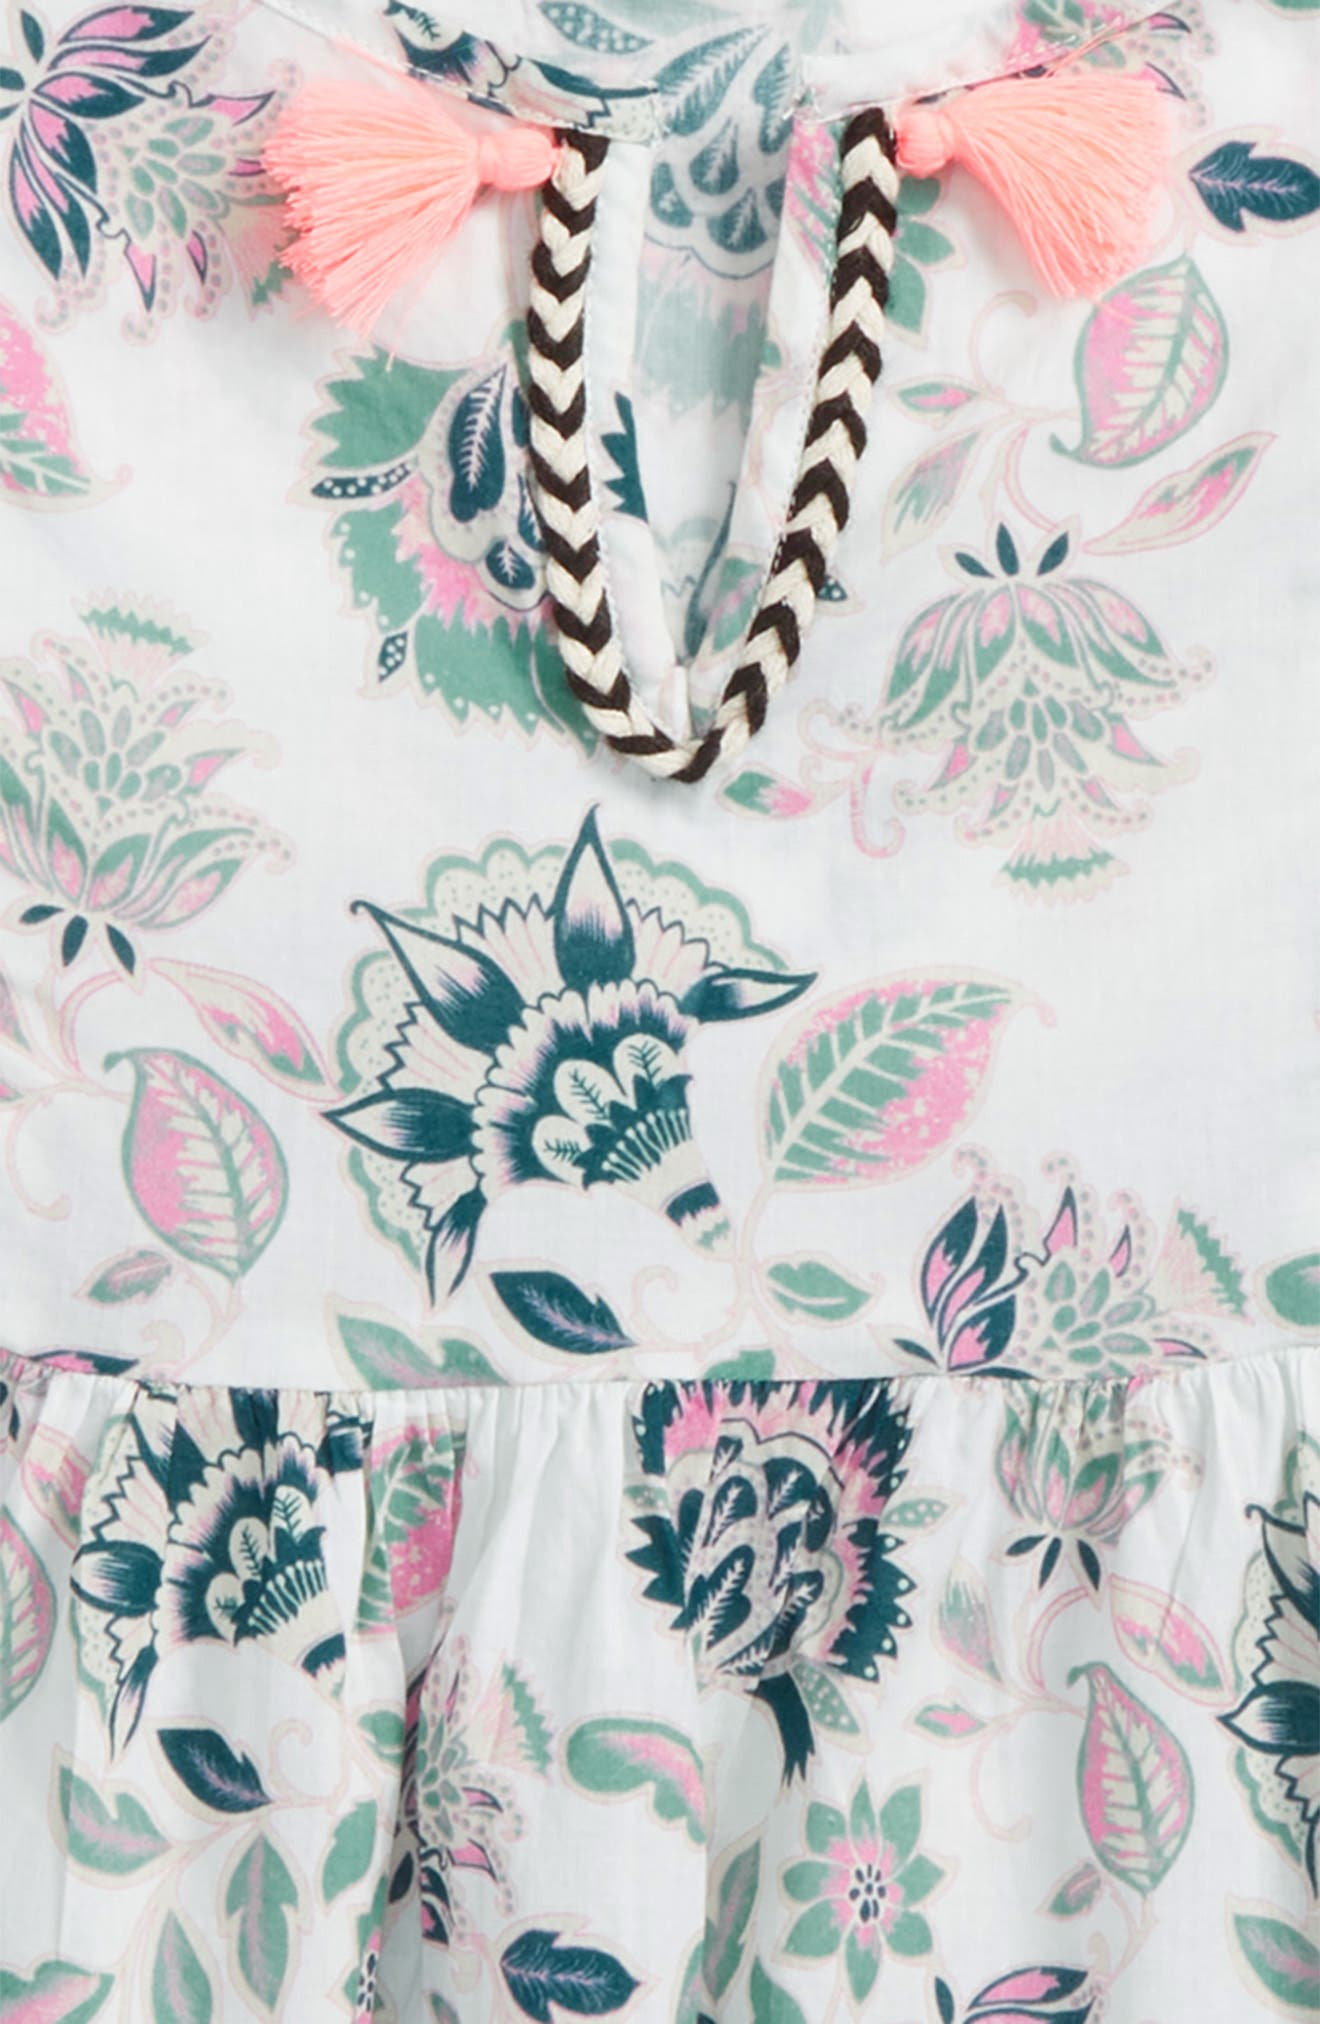 Stefani Floral Print Top,                             Alternate thumbnail 2, color,                             White